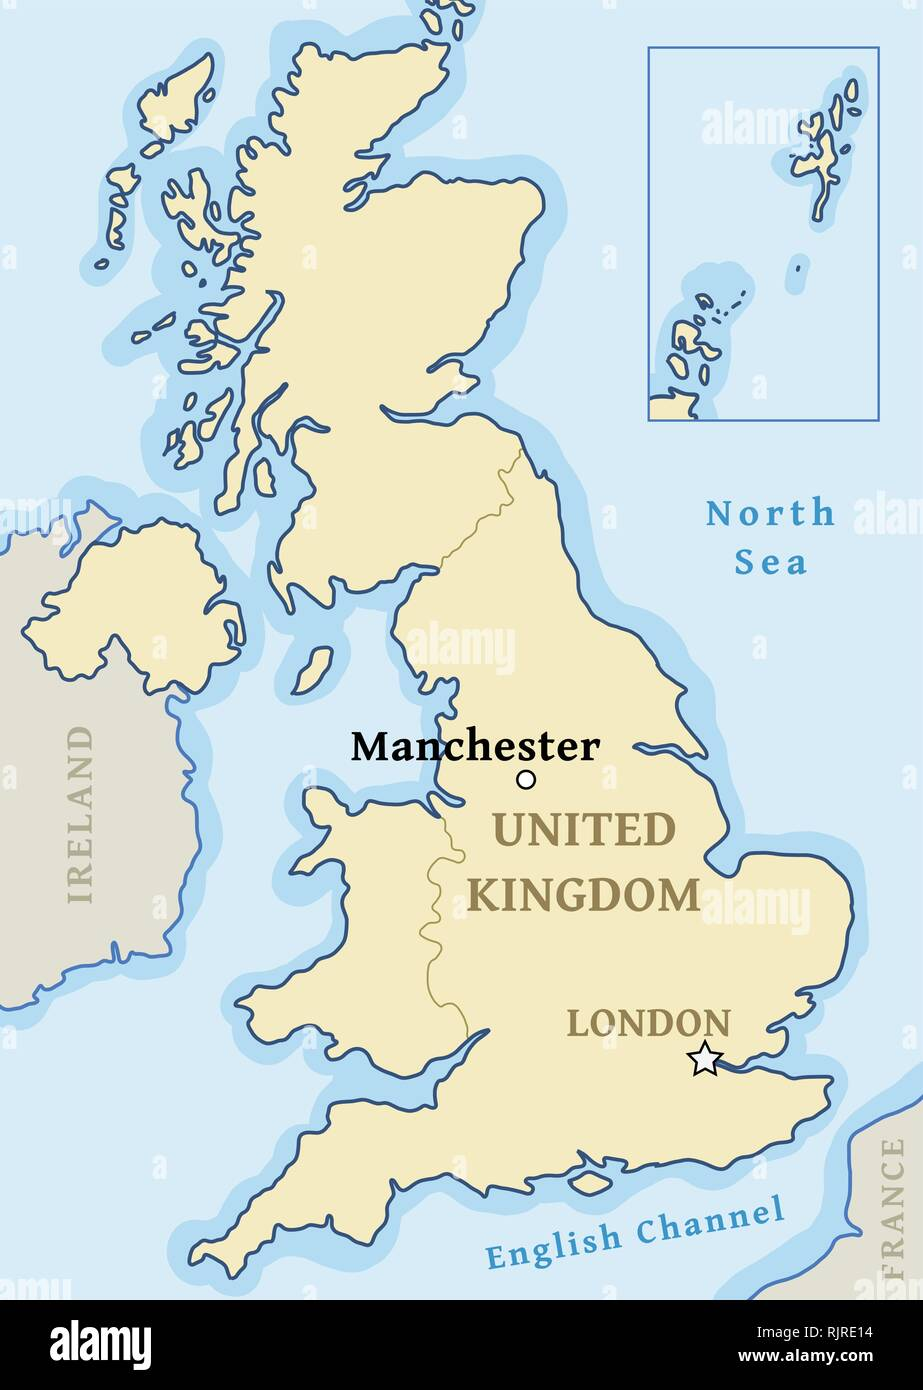 Karte Uk.Manchester Karte Lage Stadt Gepragt In Vereinigtes